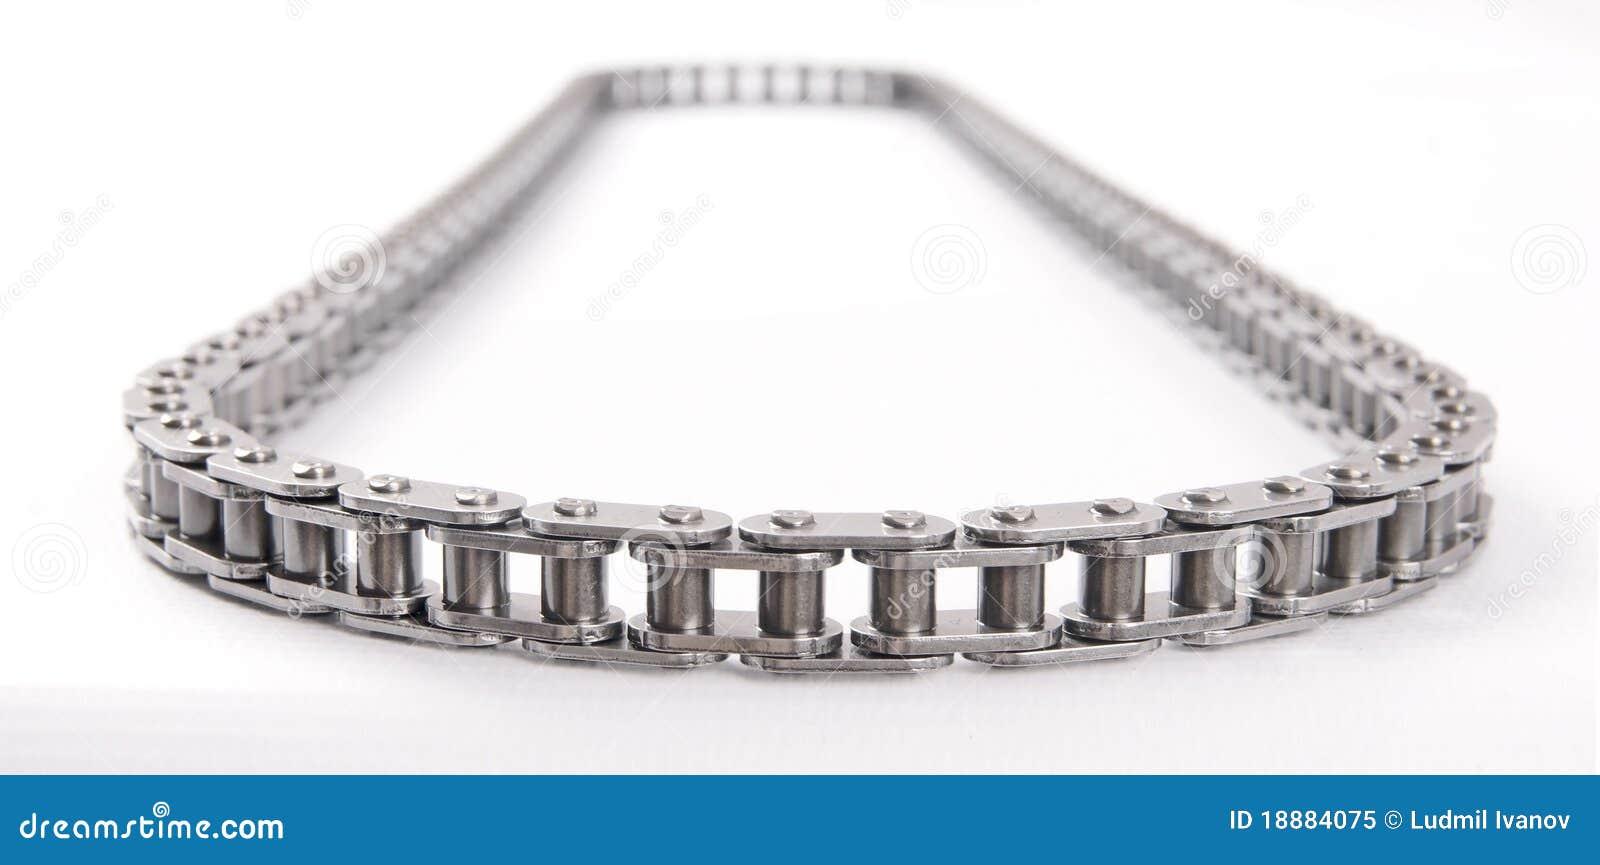 Motor Chain Royalty Free Stock Photo Image 18884075